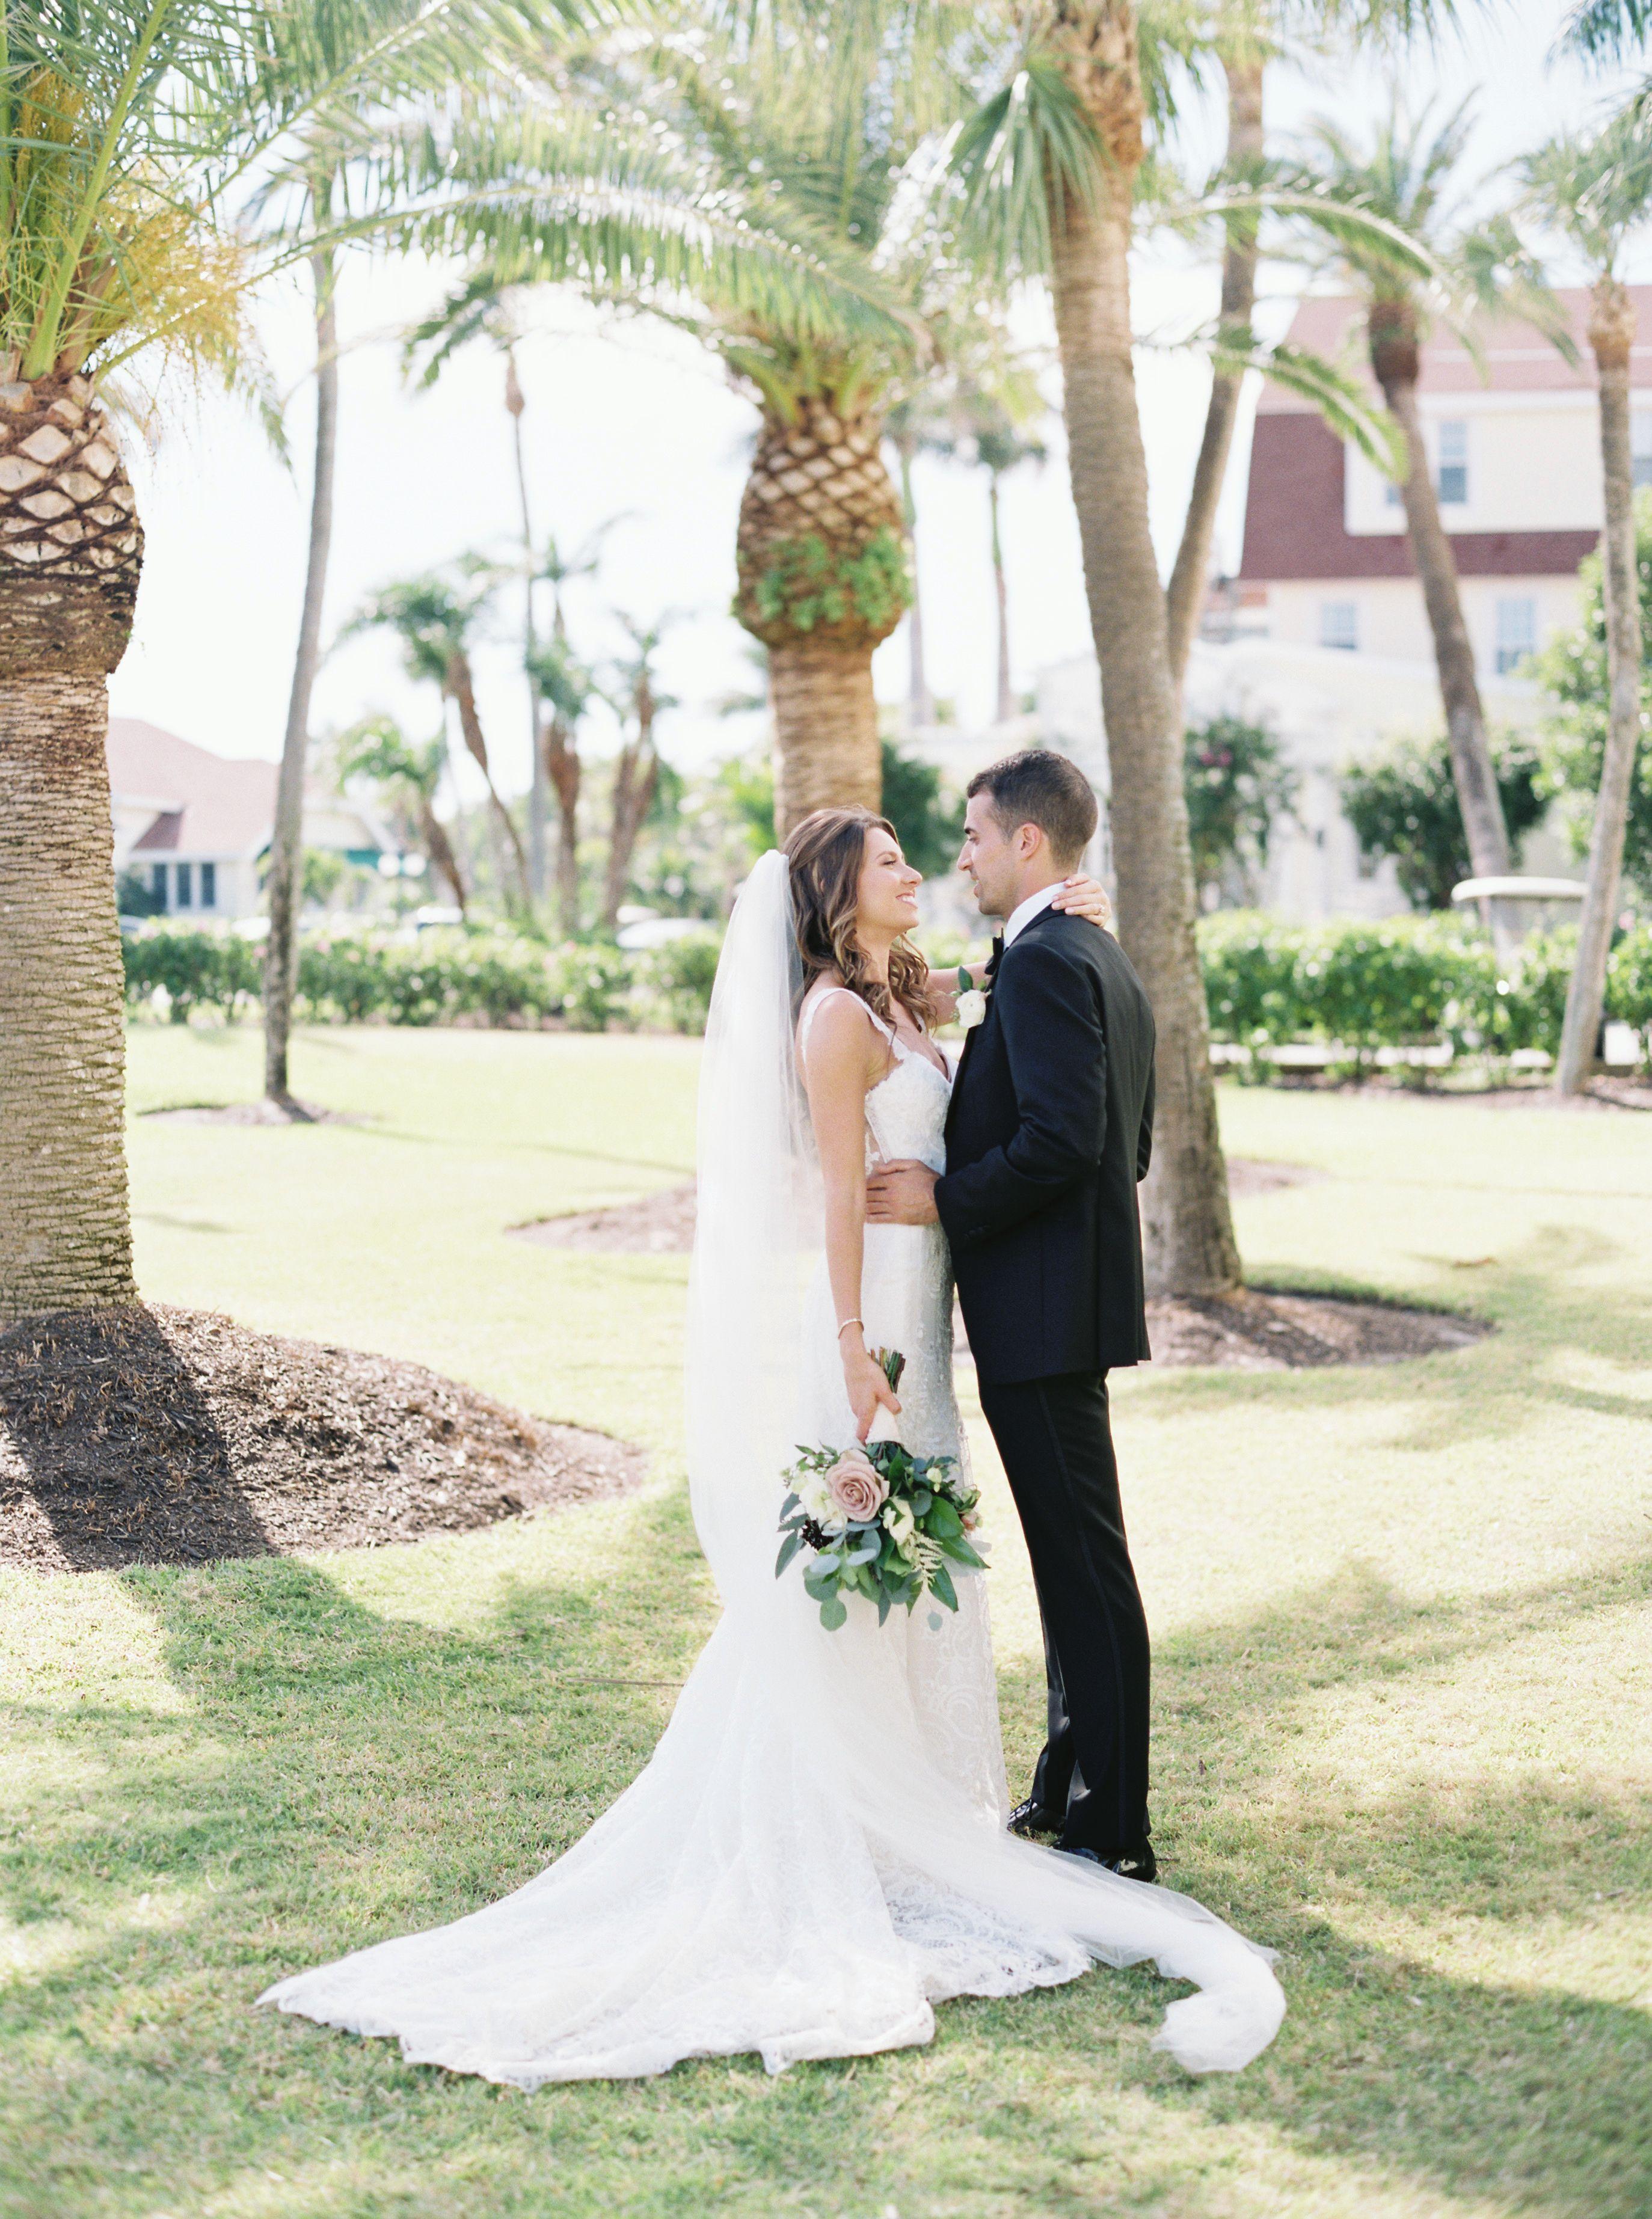 Nkweddings Sarasotawedding Gasparillainnwedding Sarasotaweddingplanner Outdoorwed Florida Wedding Venues Wedding Venues Beach Florida Wedding Venues Beach